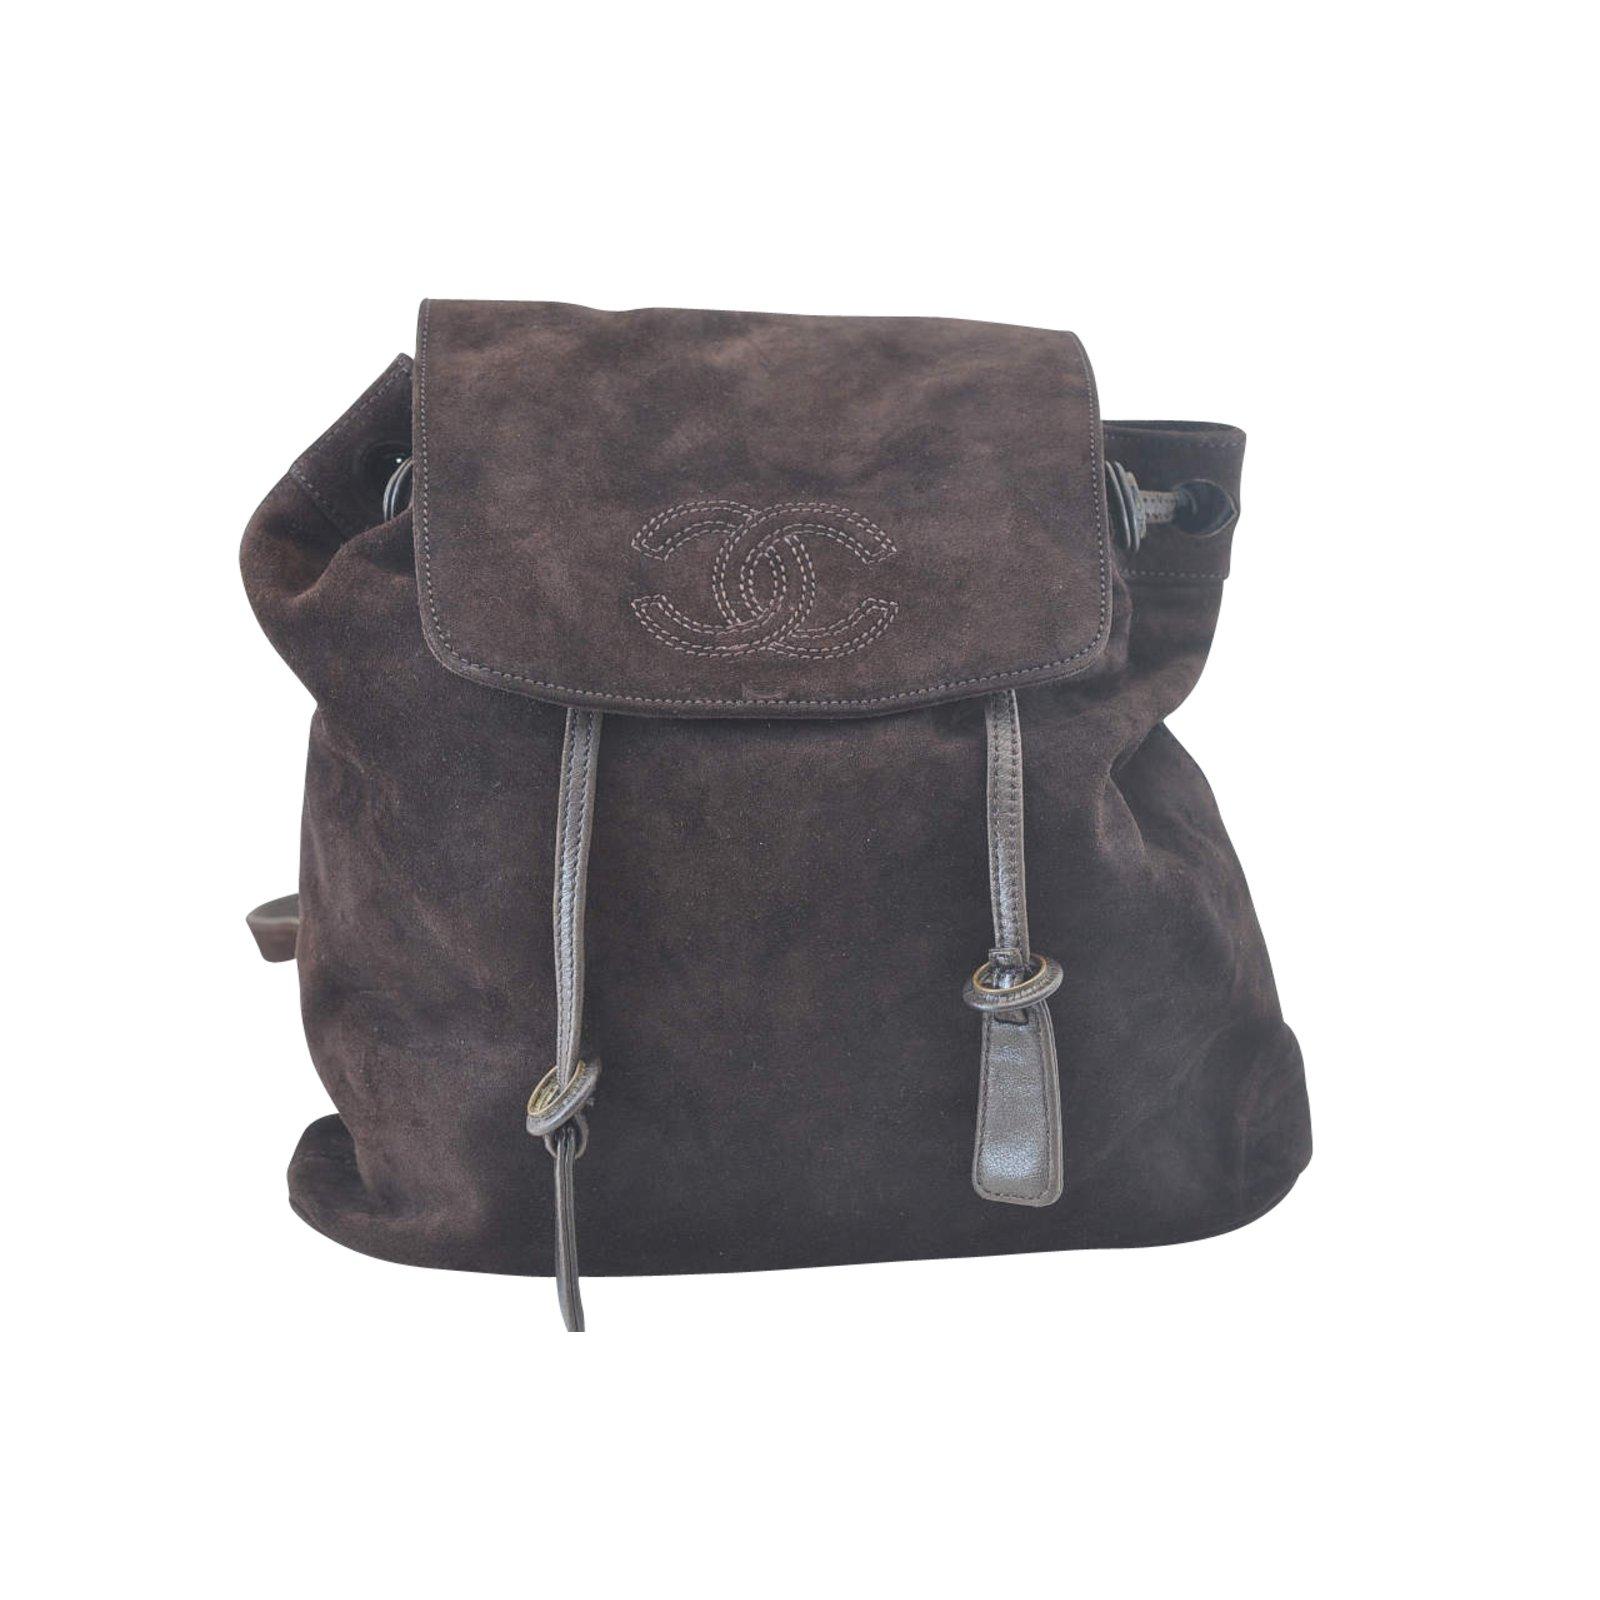 dead78301ac2e4 Chanel Backpack Handbags Other Brown ref.105022 - Joli Closet